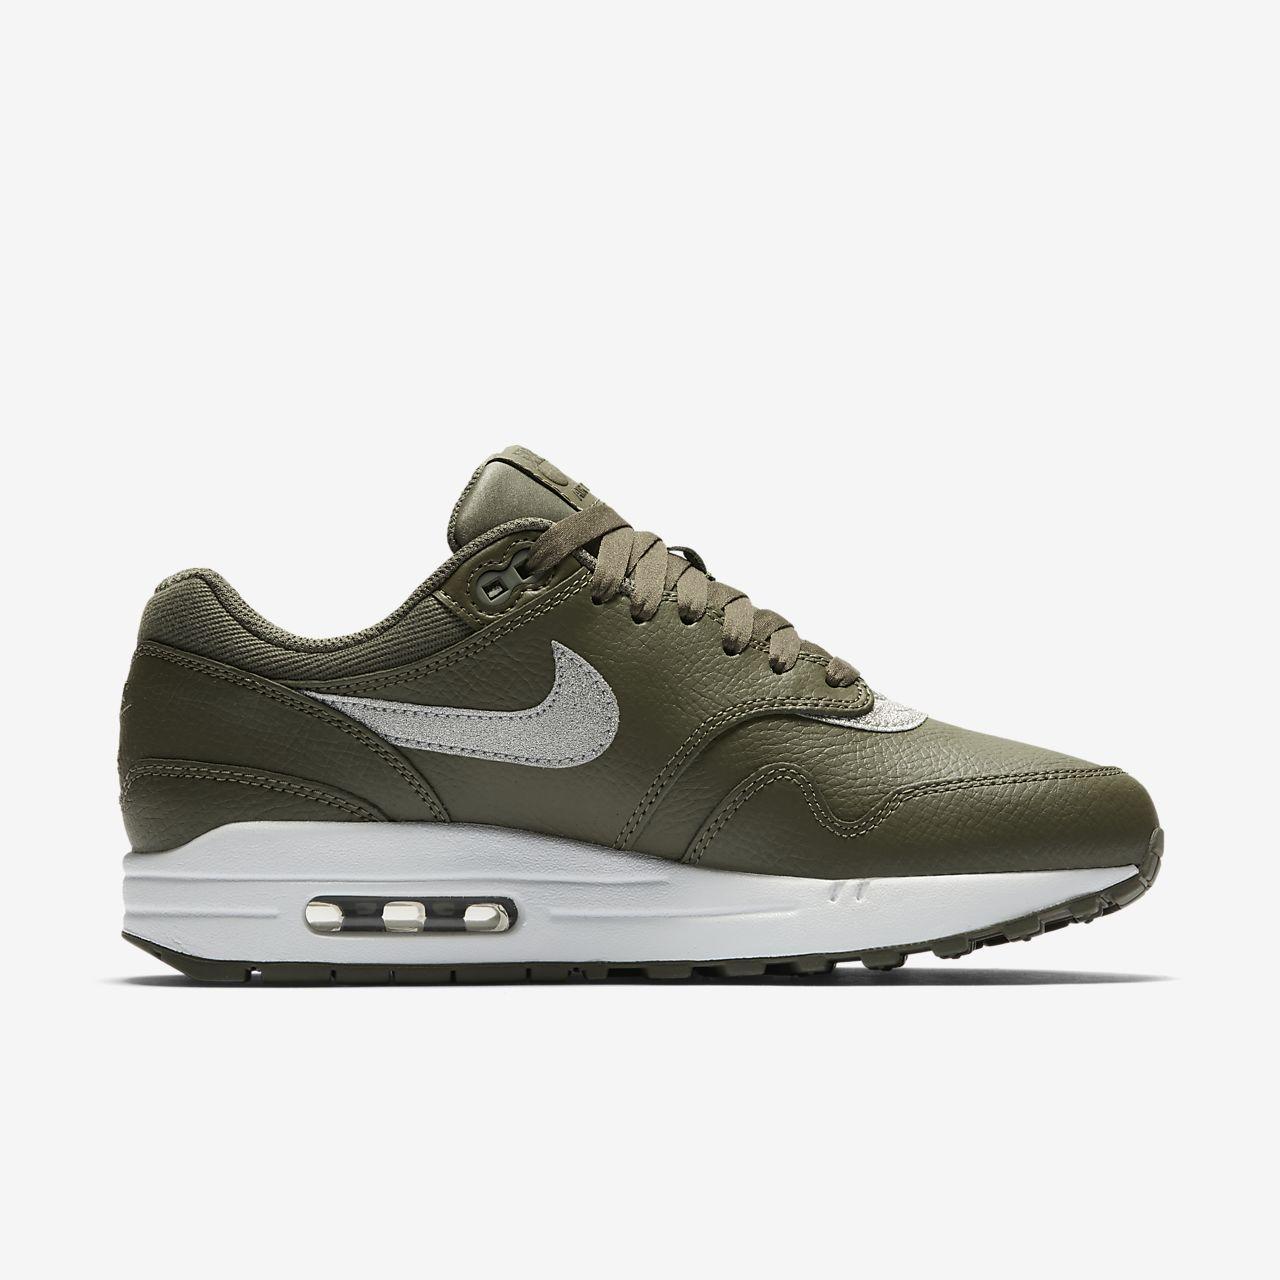 caa636b6a6b5 Nike Air Max 1 SE Glitter Women s Shoe. Nike.com AT